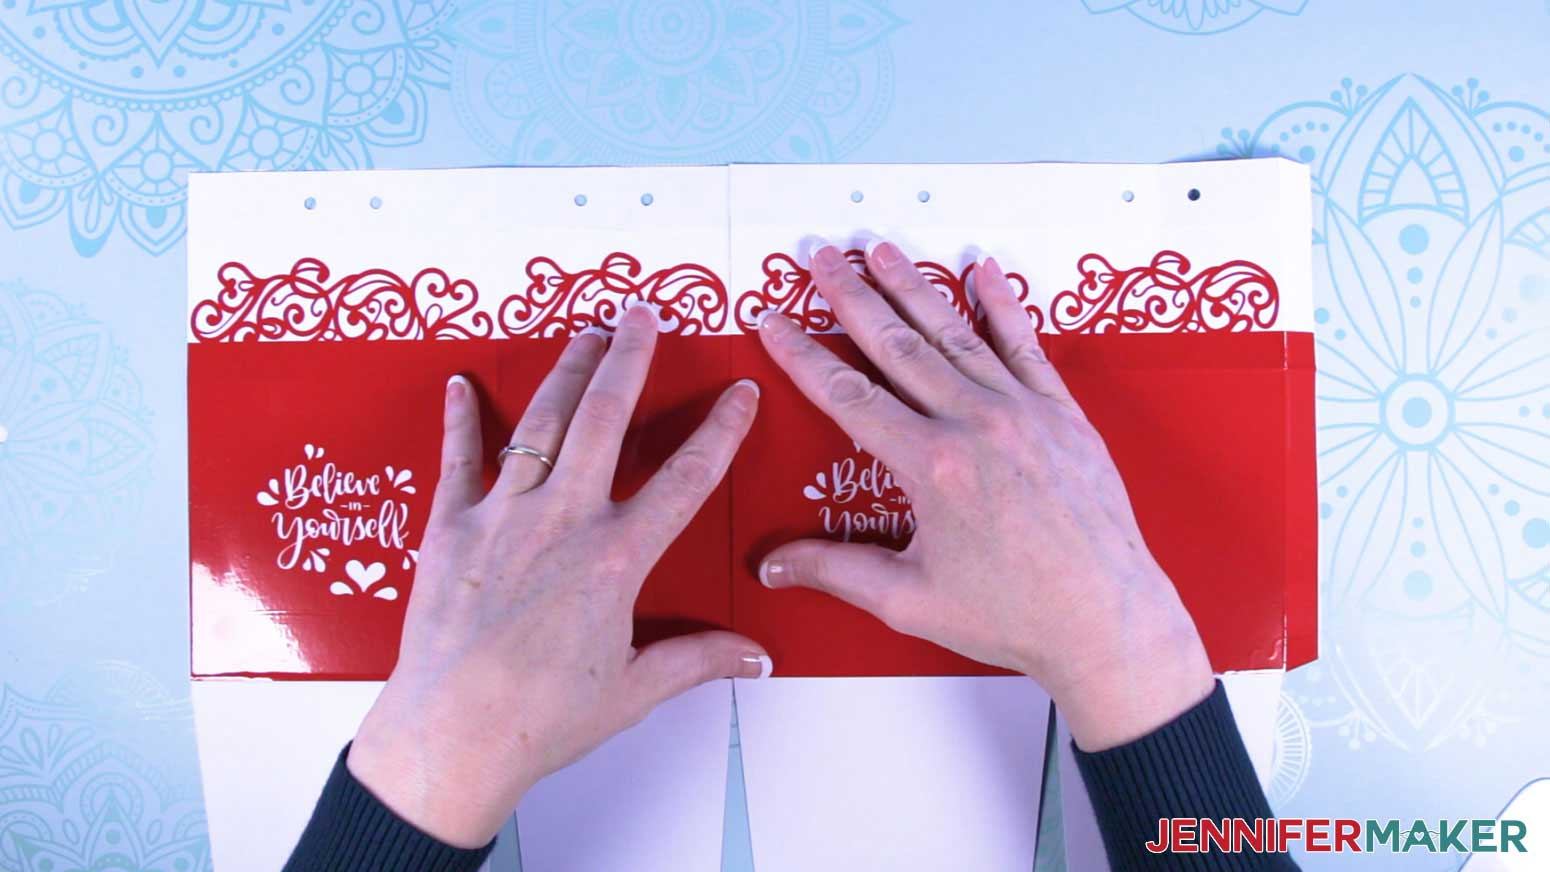 Align the milk carton mug gift box sections